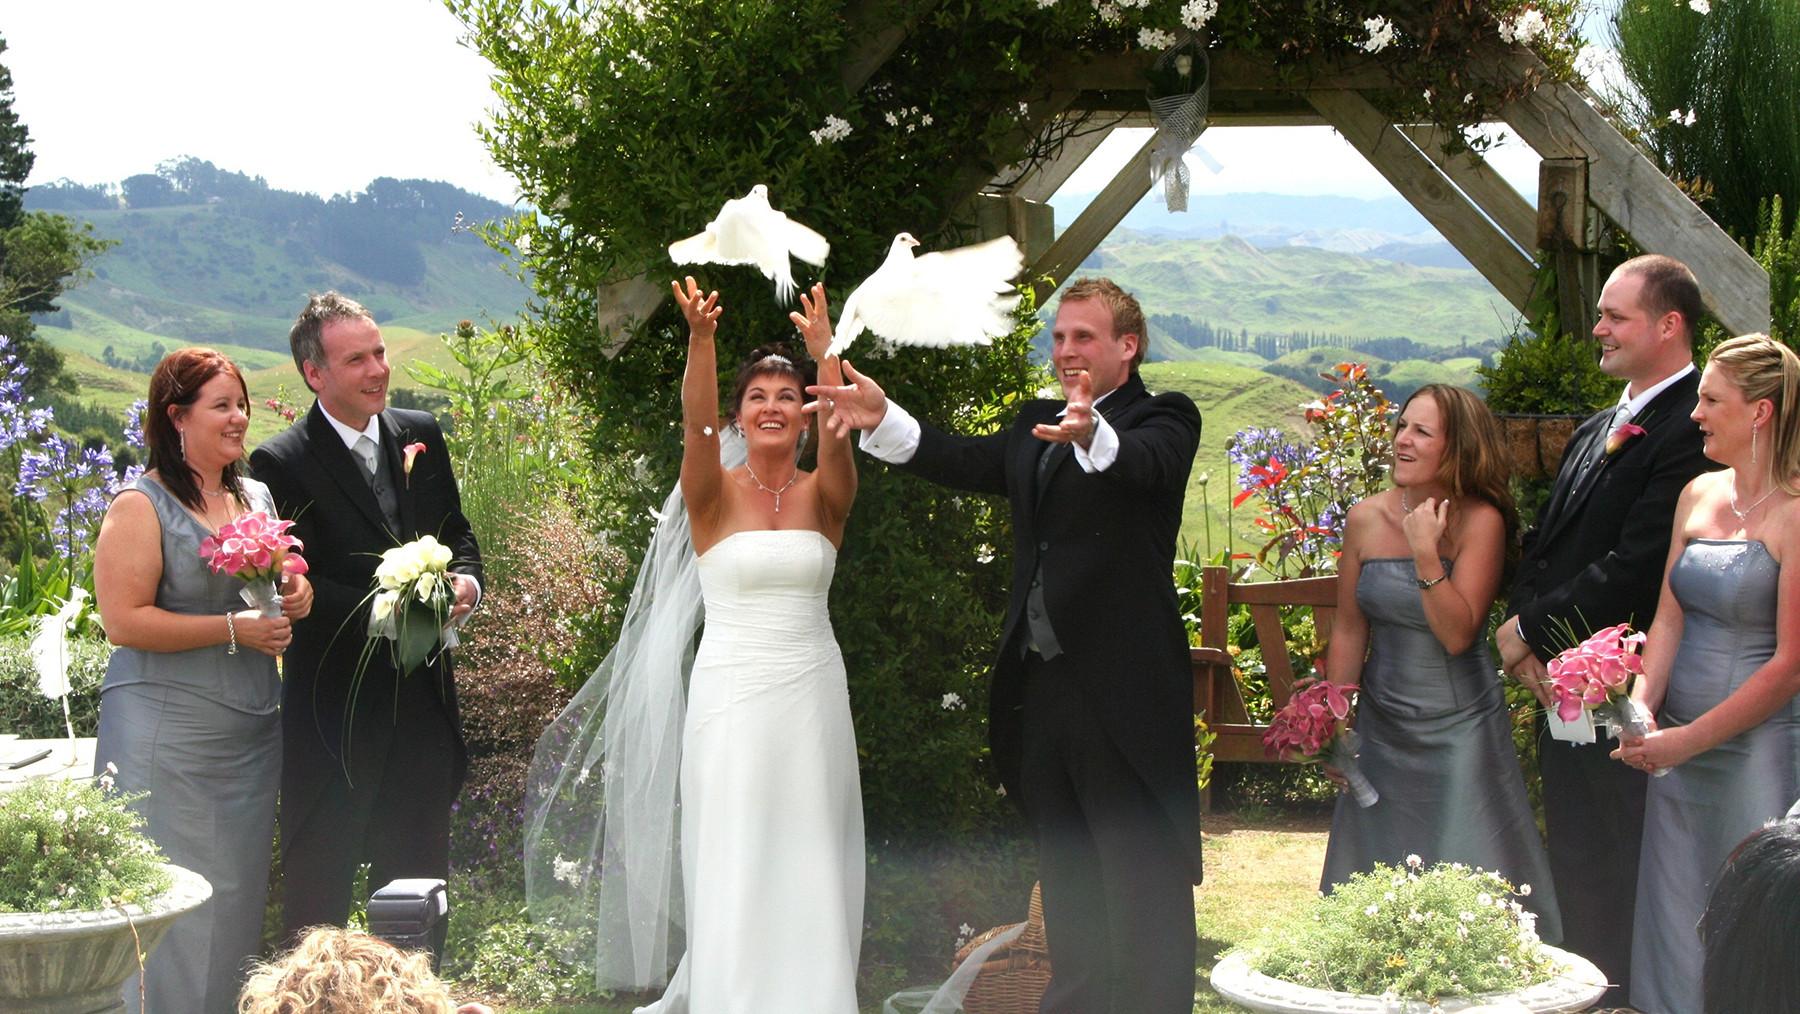 Orlando Weddings - The Wedding Service 2